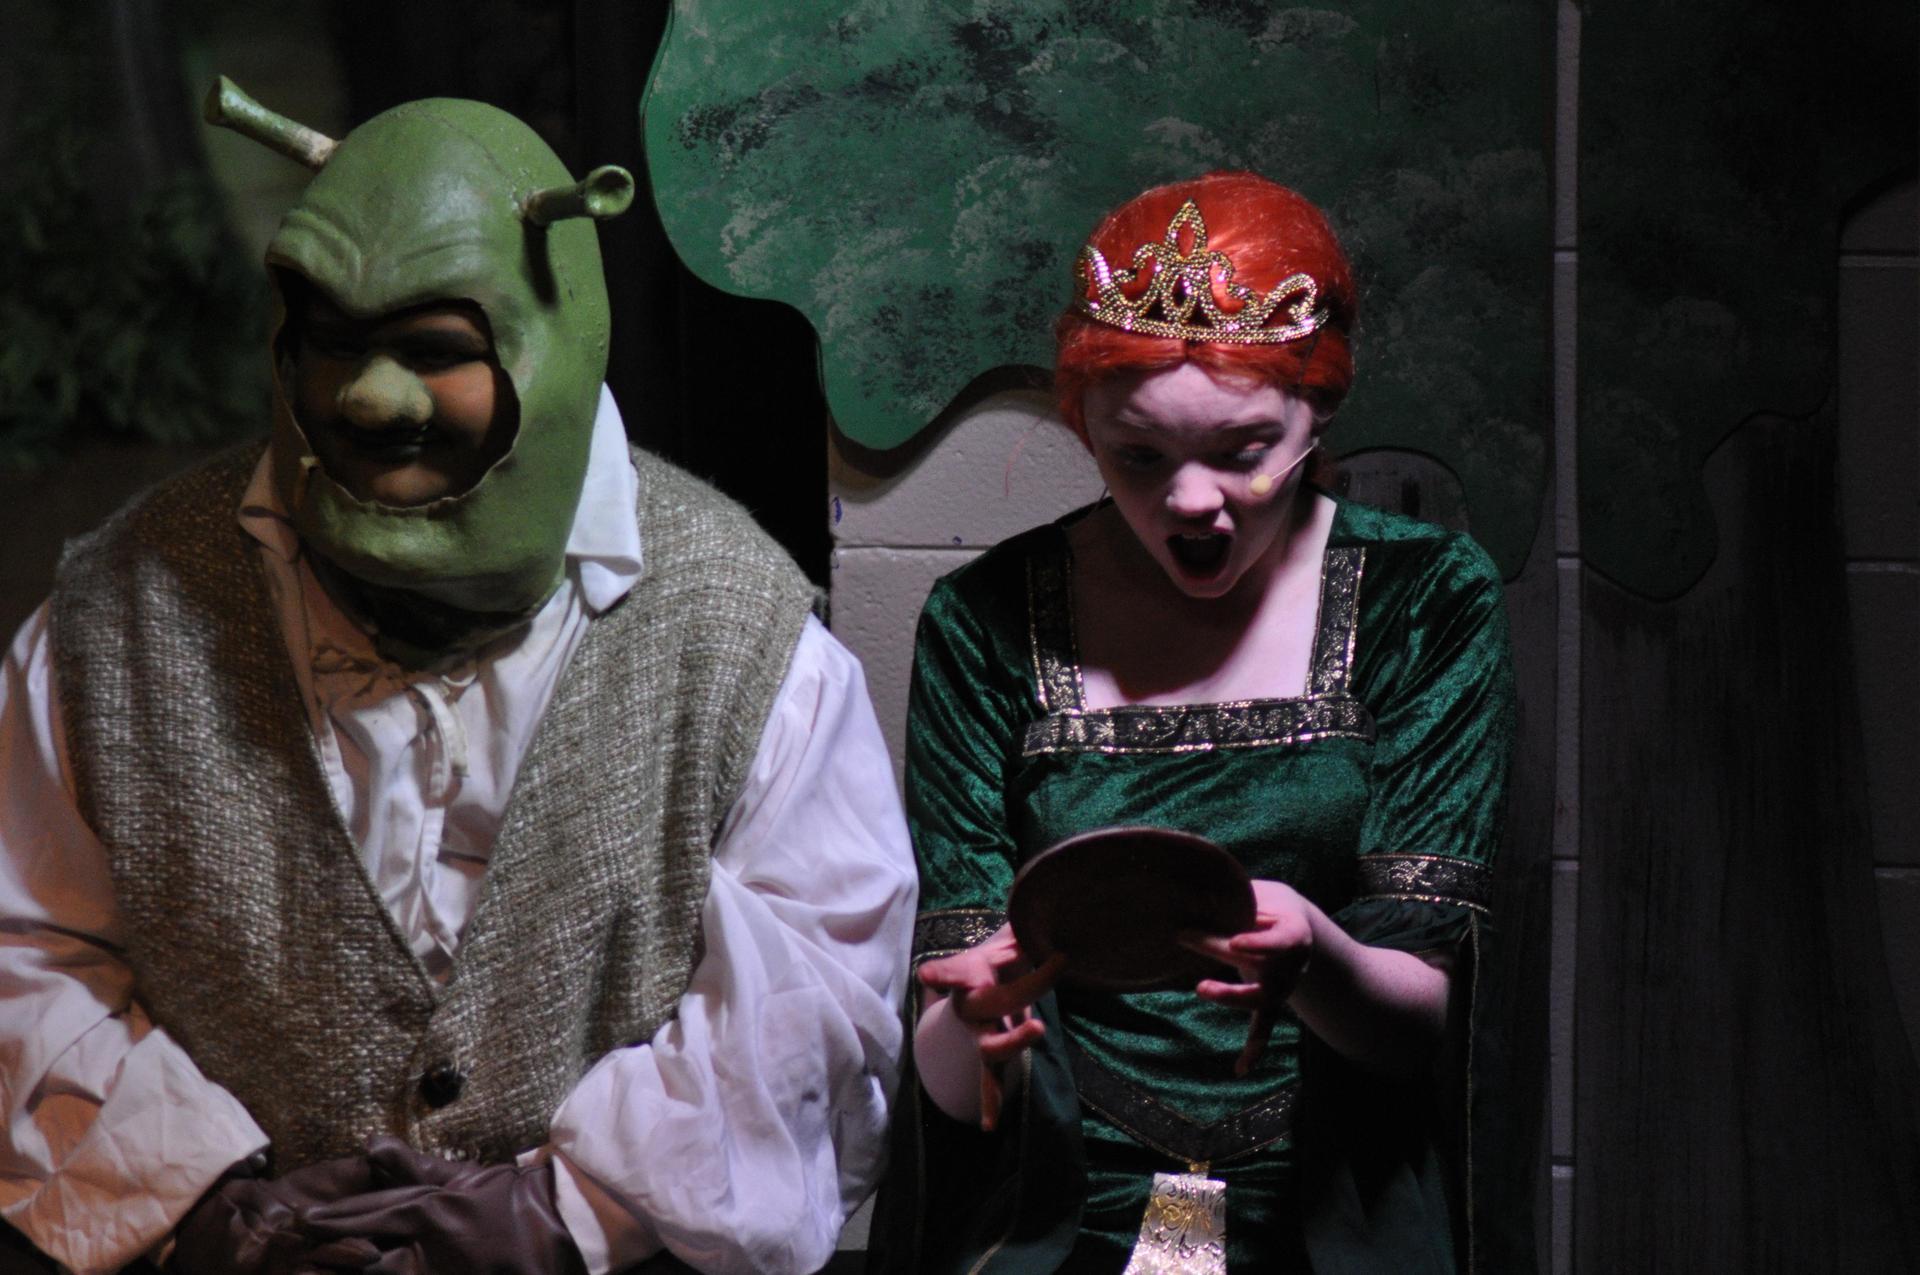 Shrek and Fiona in Children's Theater's Production of 'Shrek The Musical Jr.' in January 2018